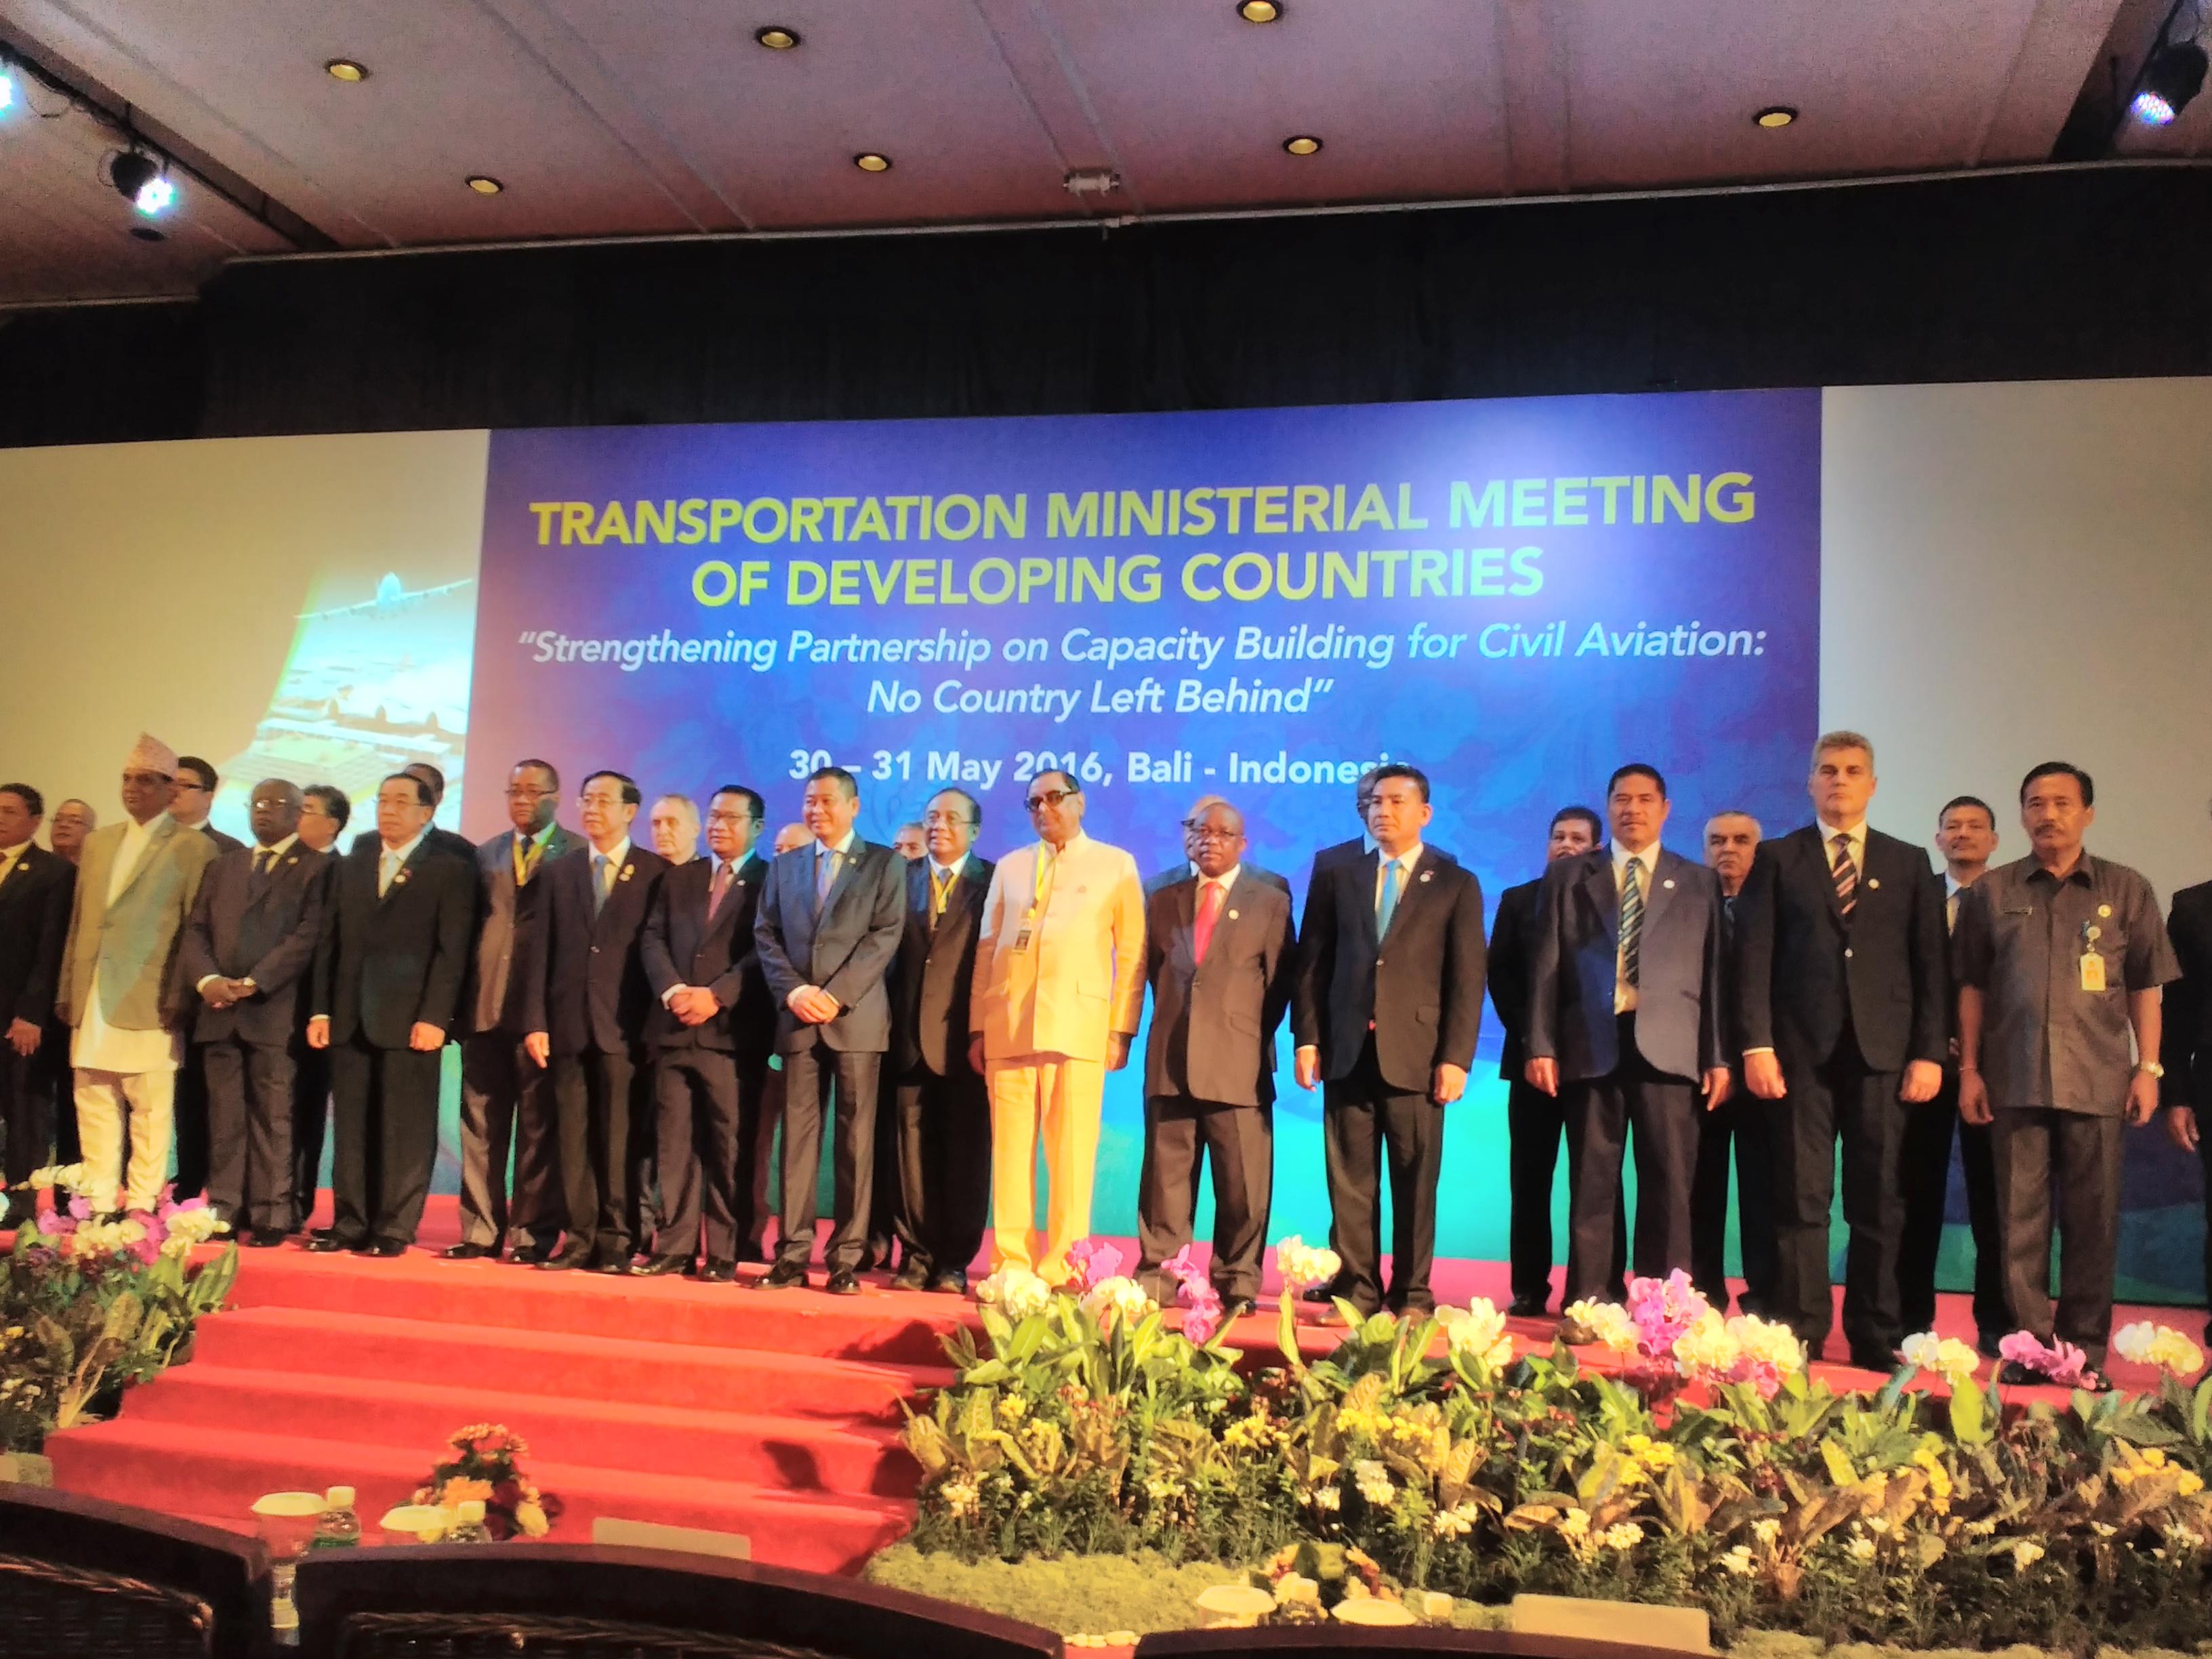 32 Negara Berkembang Berembuk di Bali Bahas Peningkatan Kerjasama dan Layanan Penerbangan Sipil